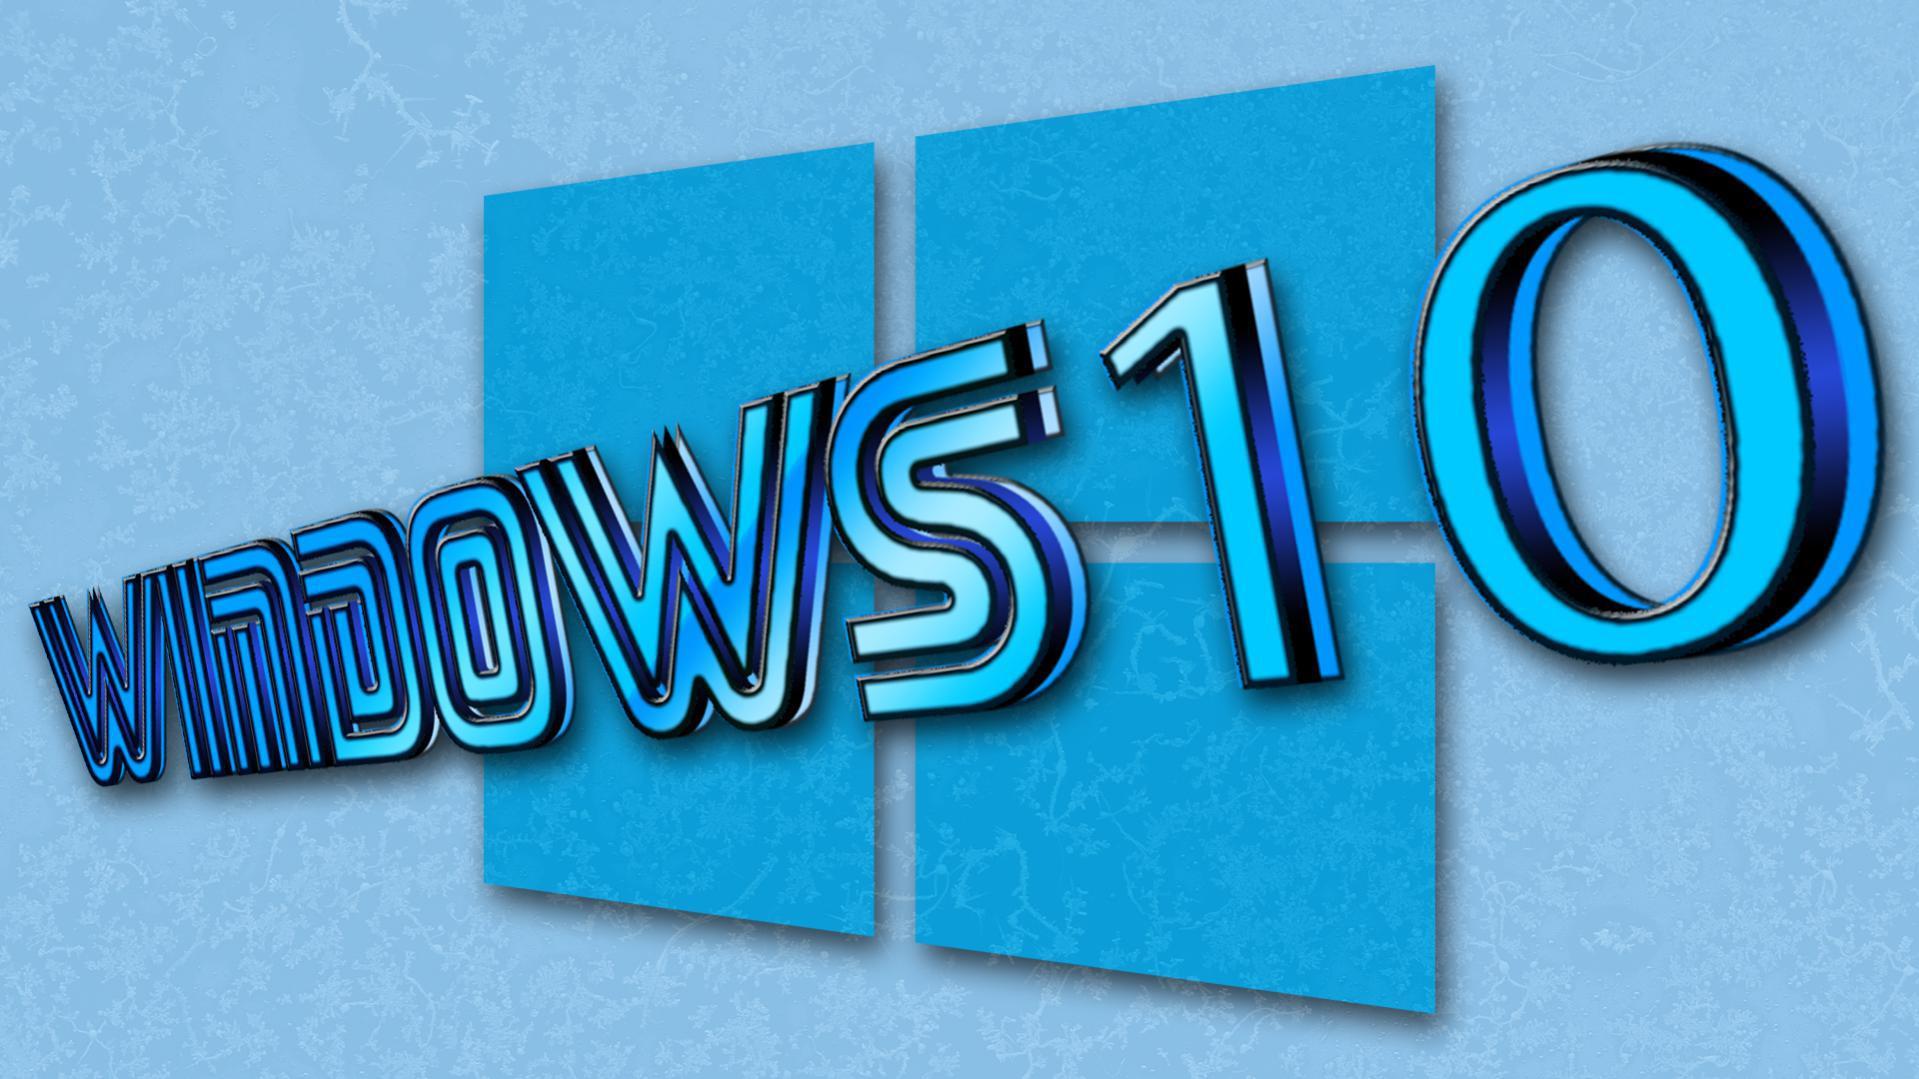 Первая сборка Windows 10 Redstone 2 готова